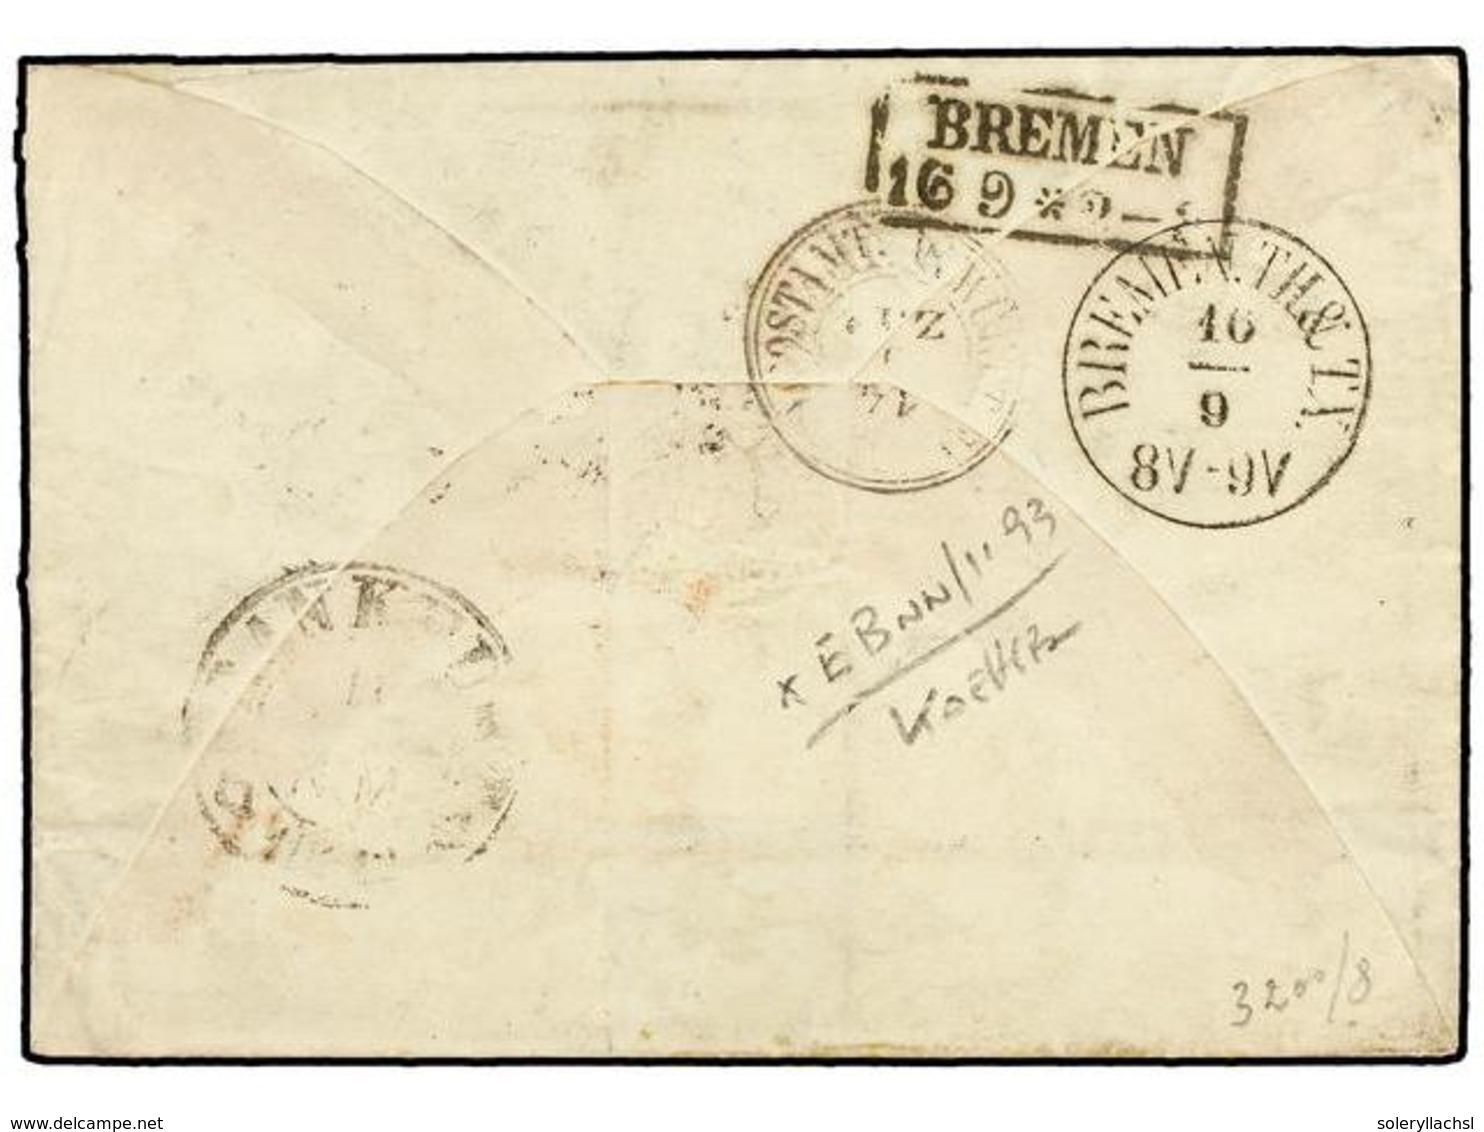 ALEMANIA ANTIGUOS ESTADOS: WURTEMBERG. Mi.25, 26, 29. 1864. STUTTGART To CHICAGO (.U.S.A.). Envelope Franked With 1 Kr.  - Non Classés